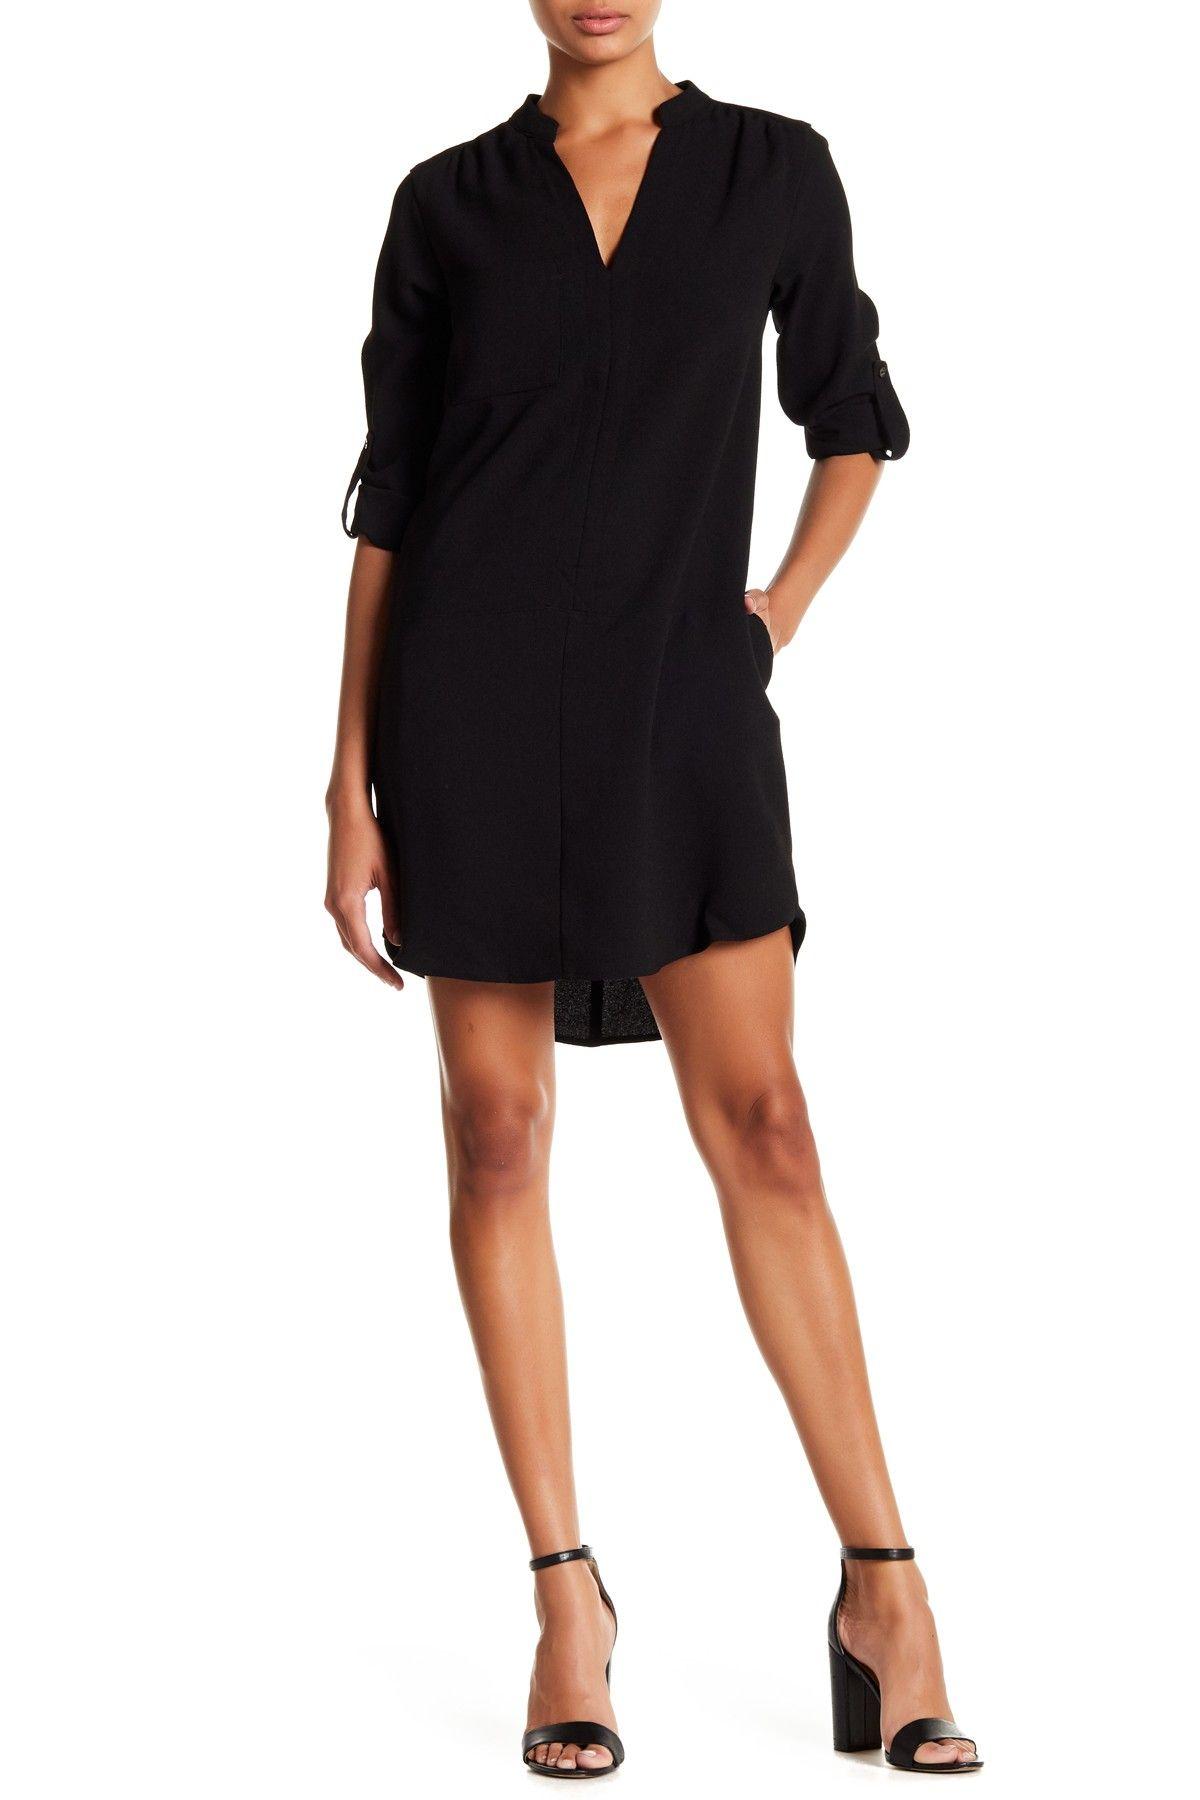 Lush Novak 3 4 Sleeve Shift Dress Nordstrom Rack In 2021 Classic Shirt Dress Shift Dress Nordstrom Dresses [ 1800 x 1200 Pixel ]